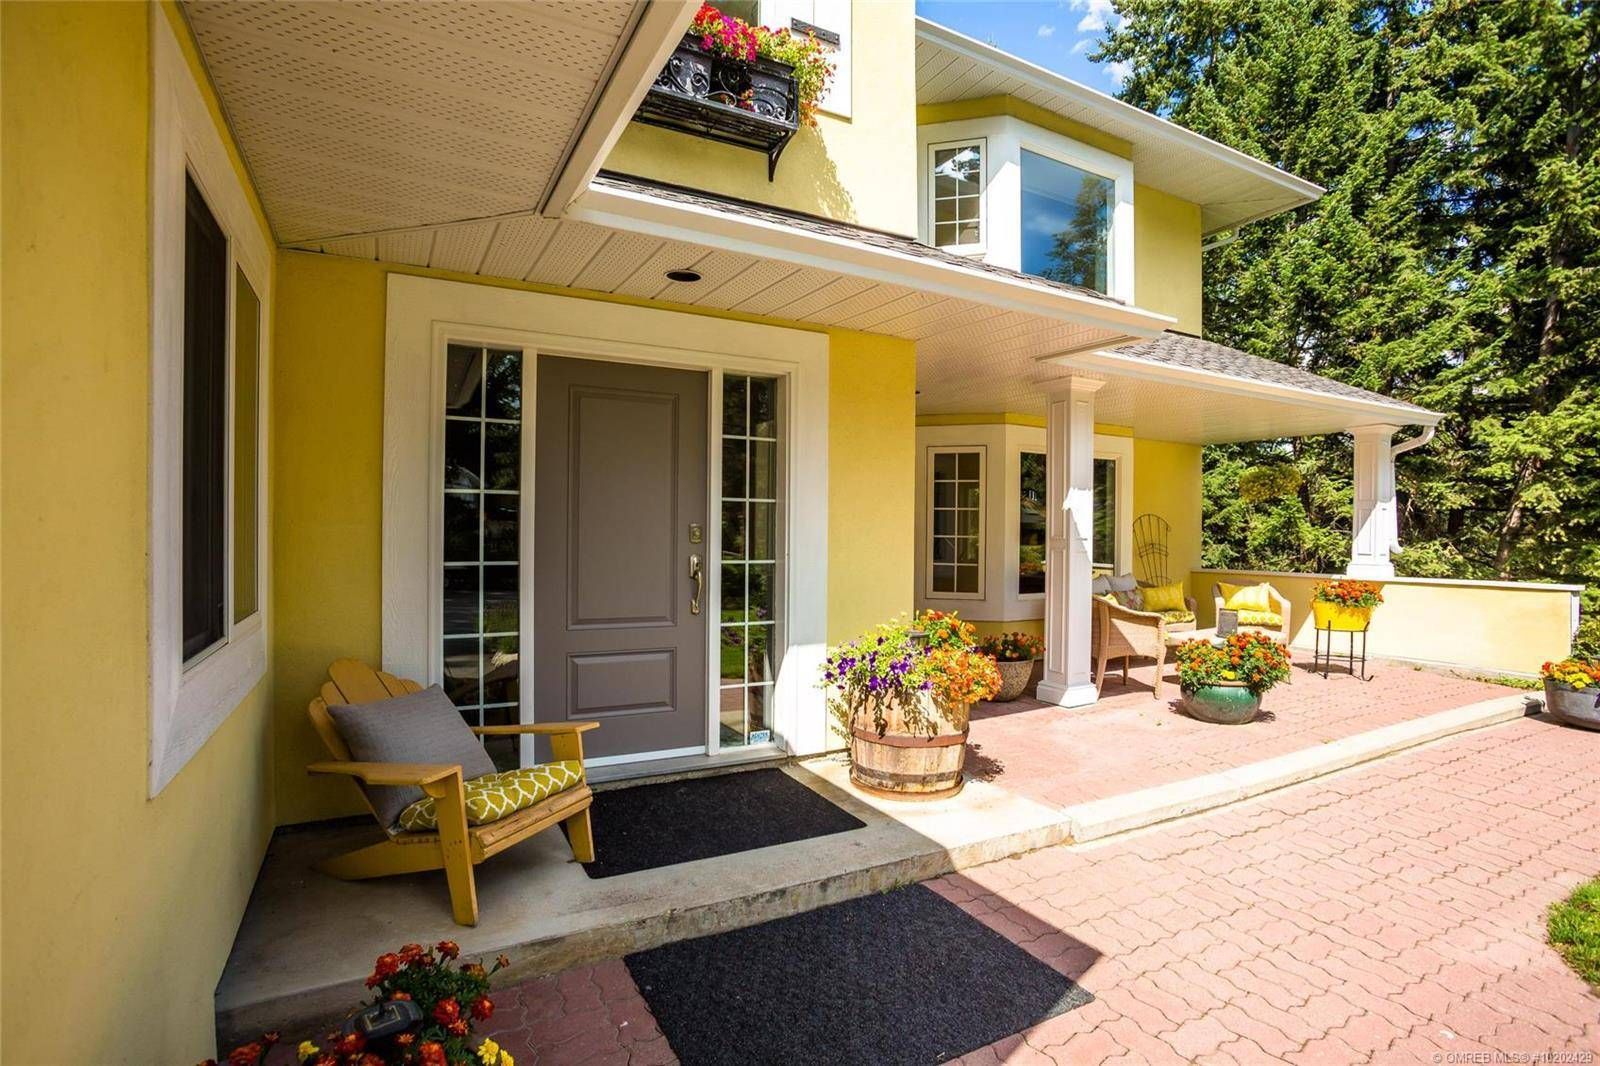 House for sale at 598 Thorneloe Rd Kelowna British Columbia - MLS: 10202429